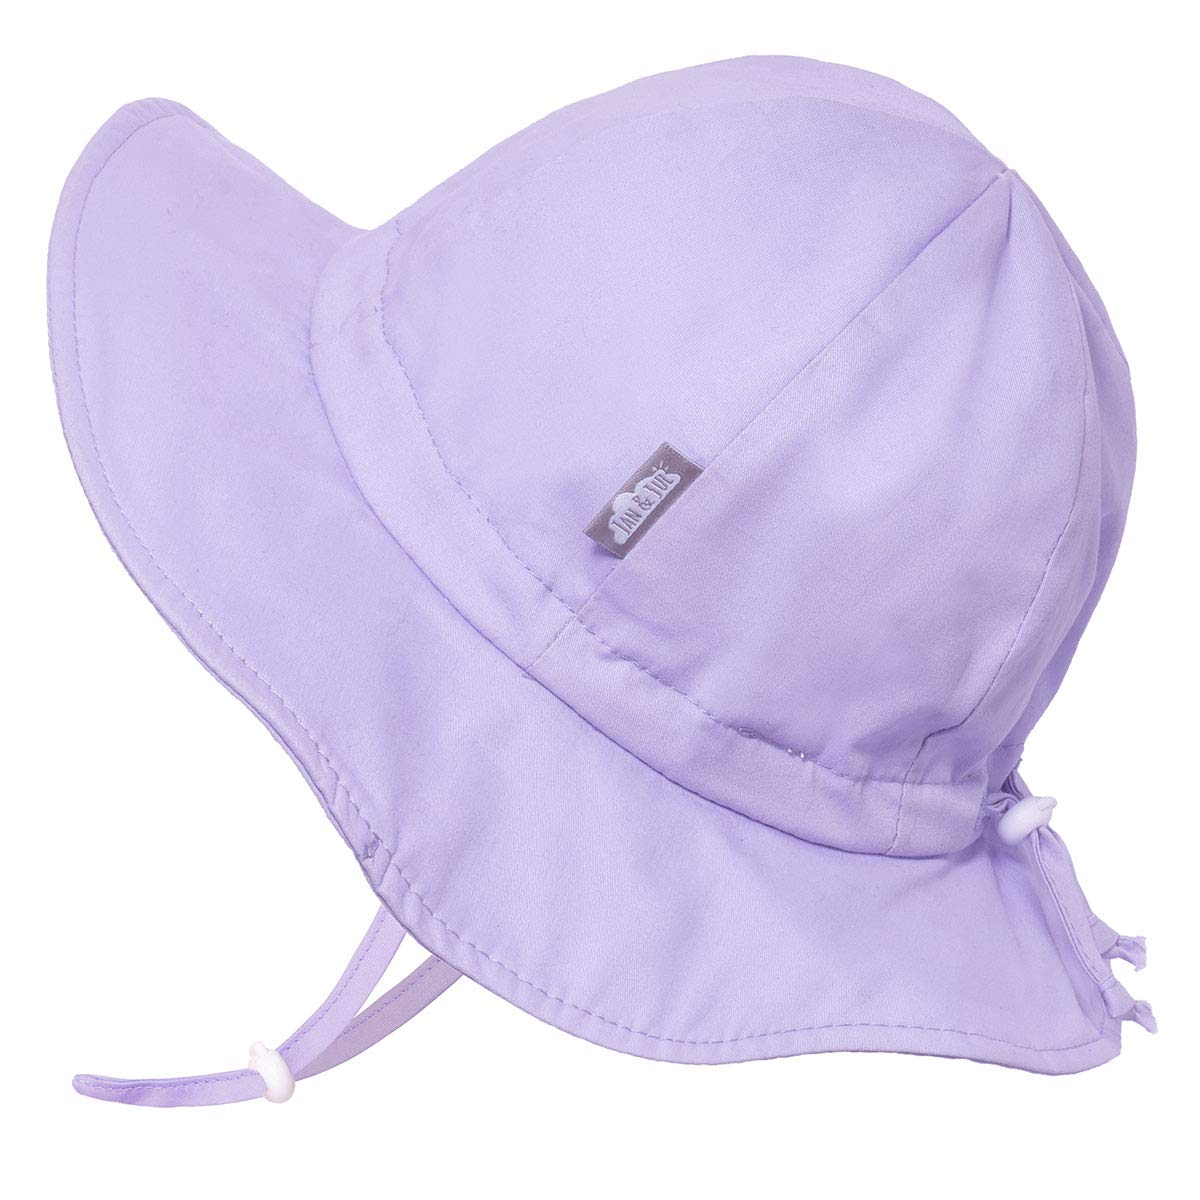 XL: 5-12Y, Lavender Size Adjustable Stay-on Tie Jan /& Jul Girls Breathable Sun-Hat 50 UPF